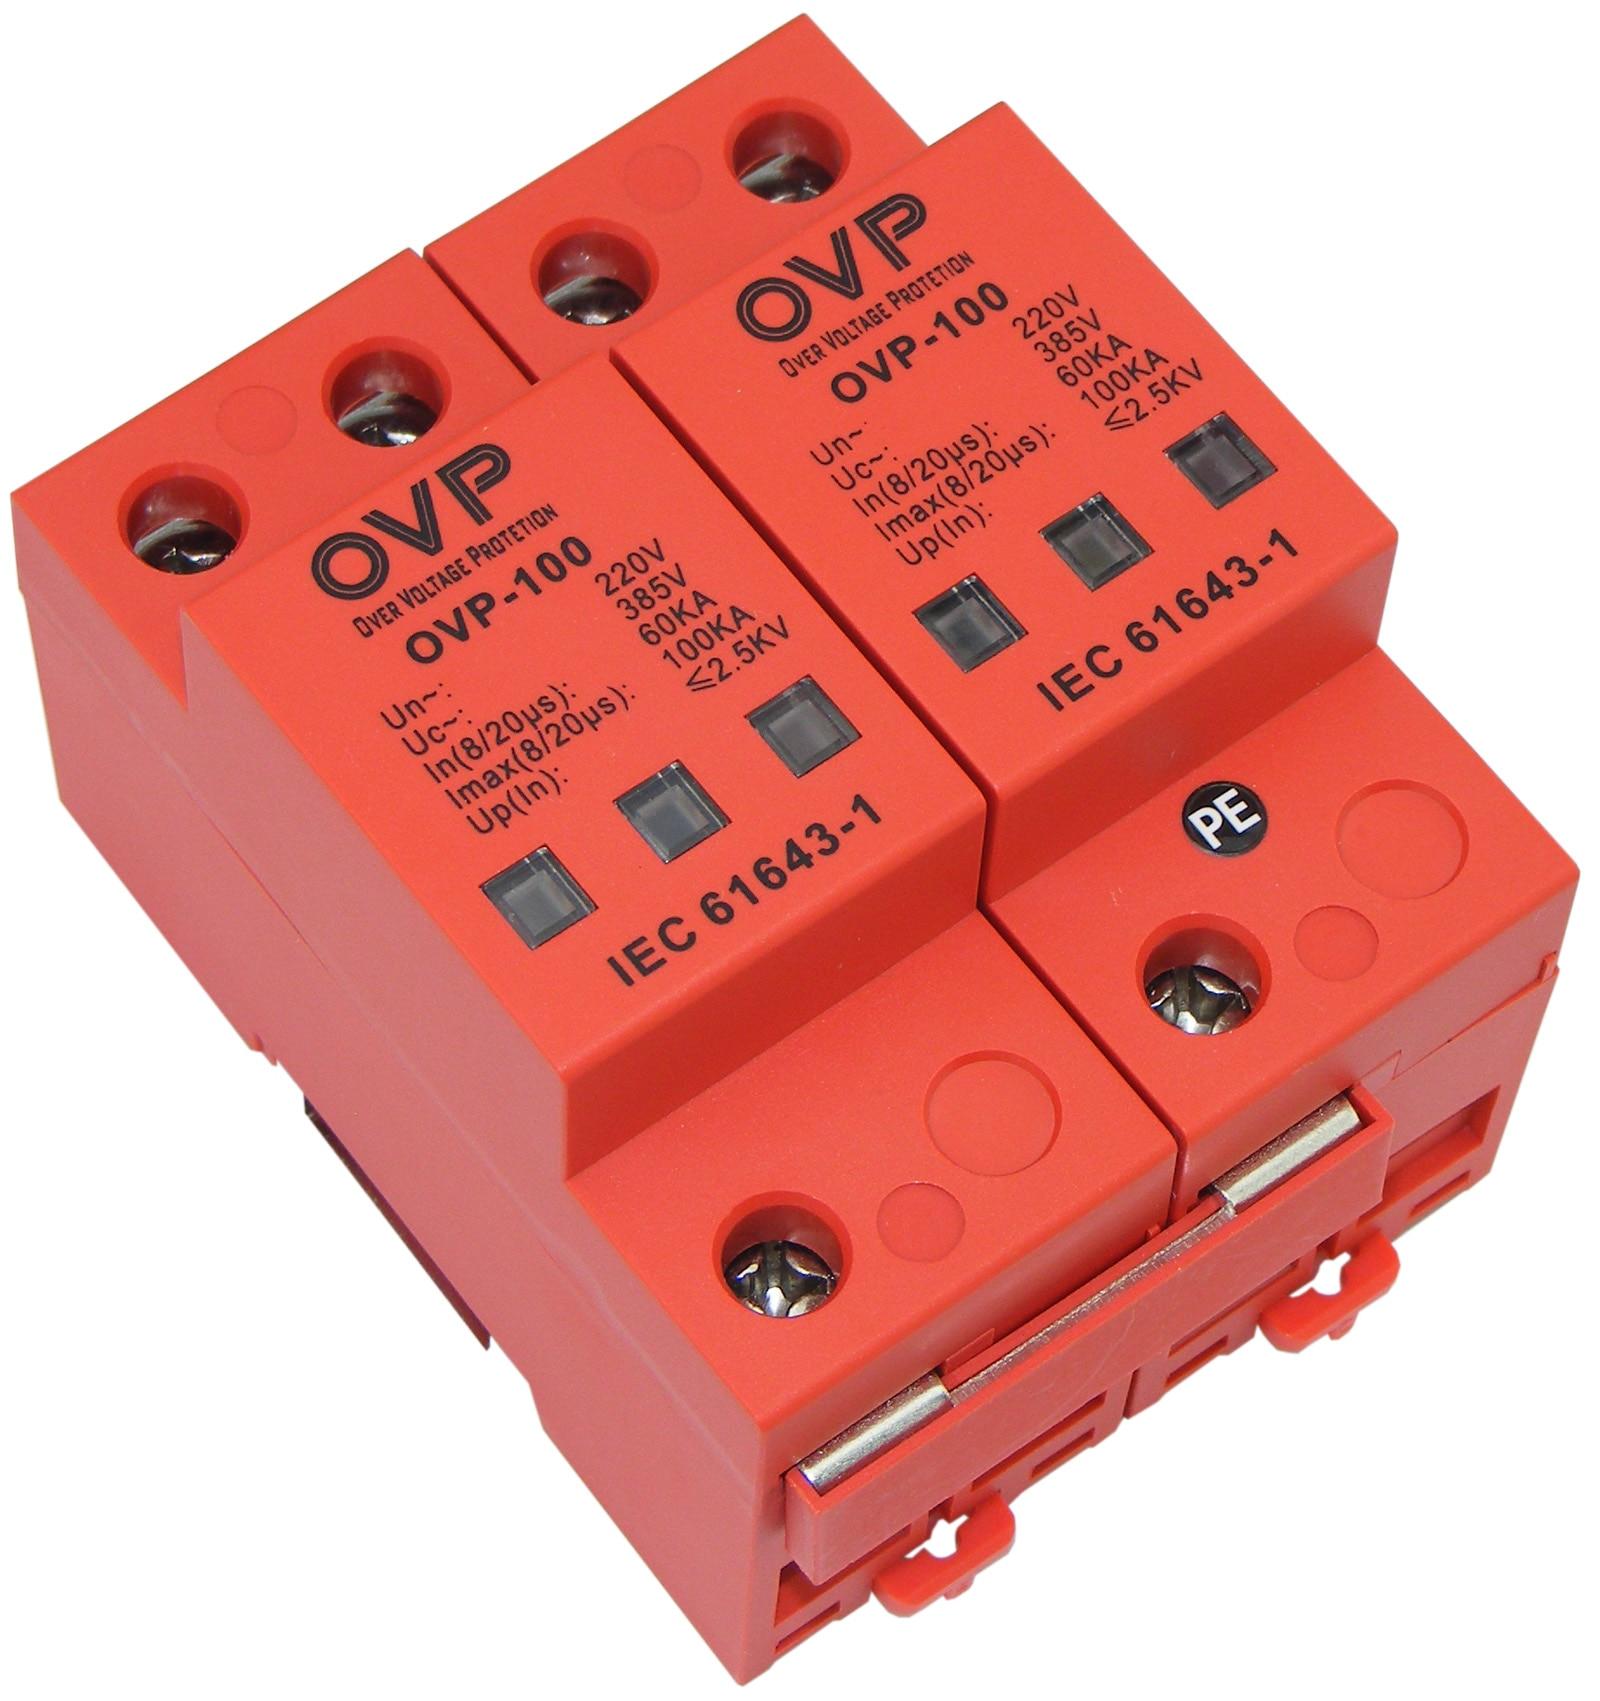 цена на 100KA220 Volt Power Supply Lightning Protection Module B Class 1 Single-phase Power Lightning Arrester OVP-100/2P